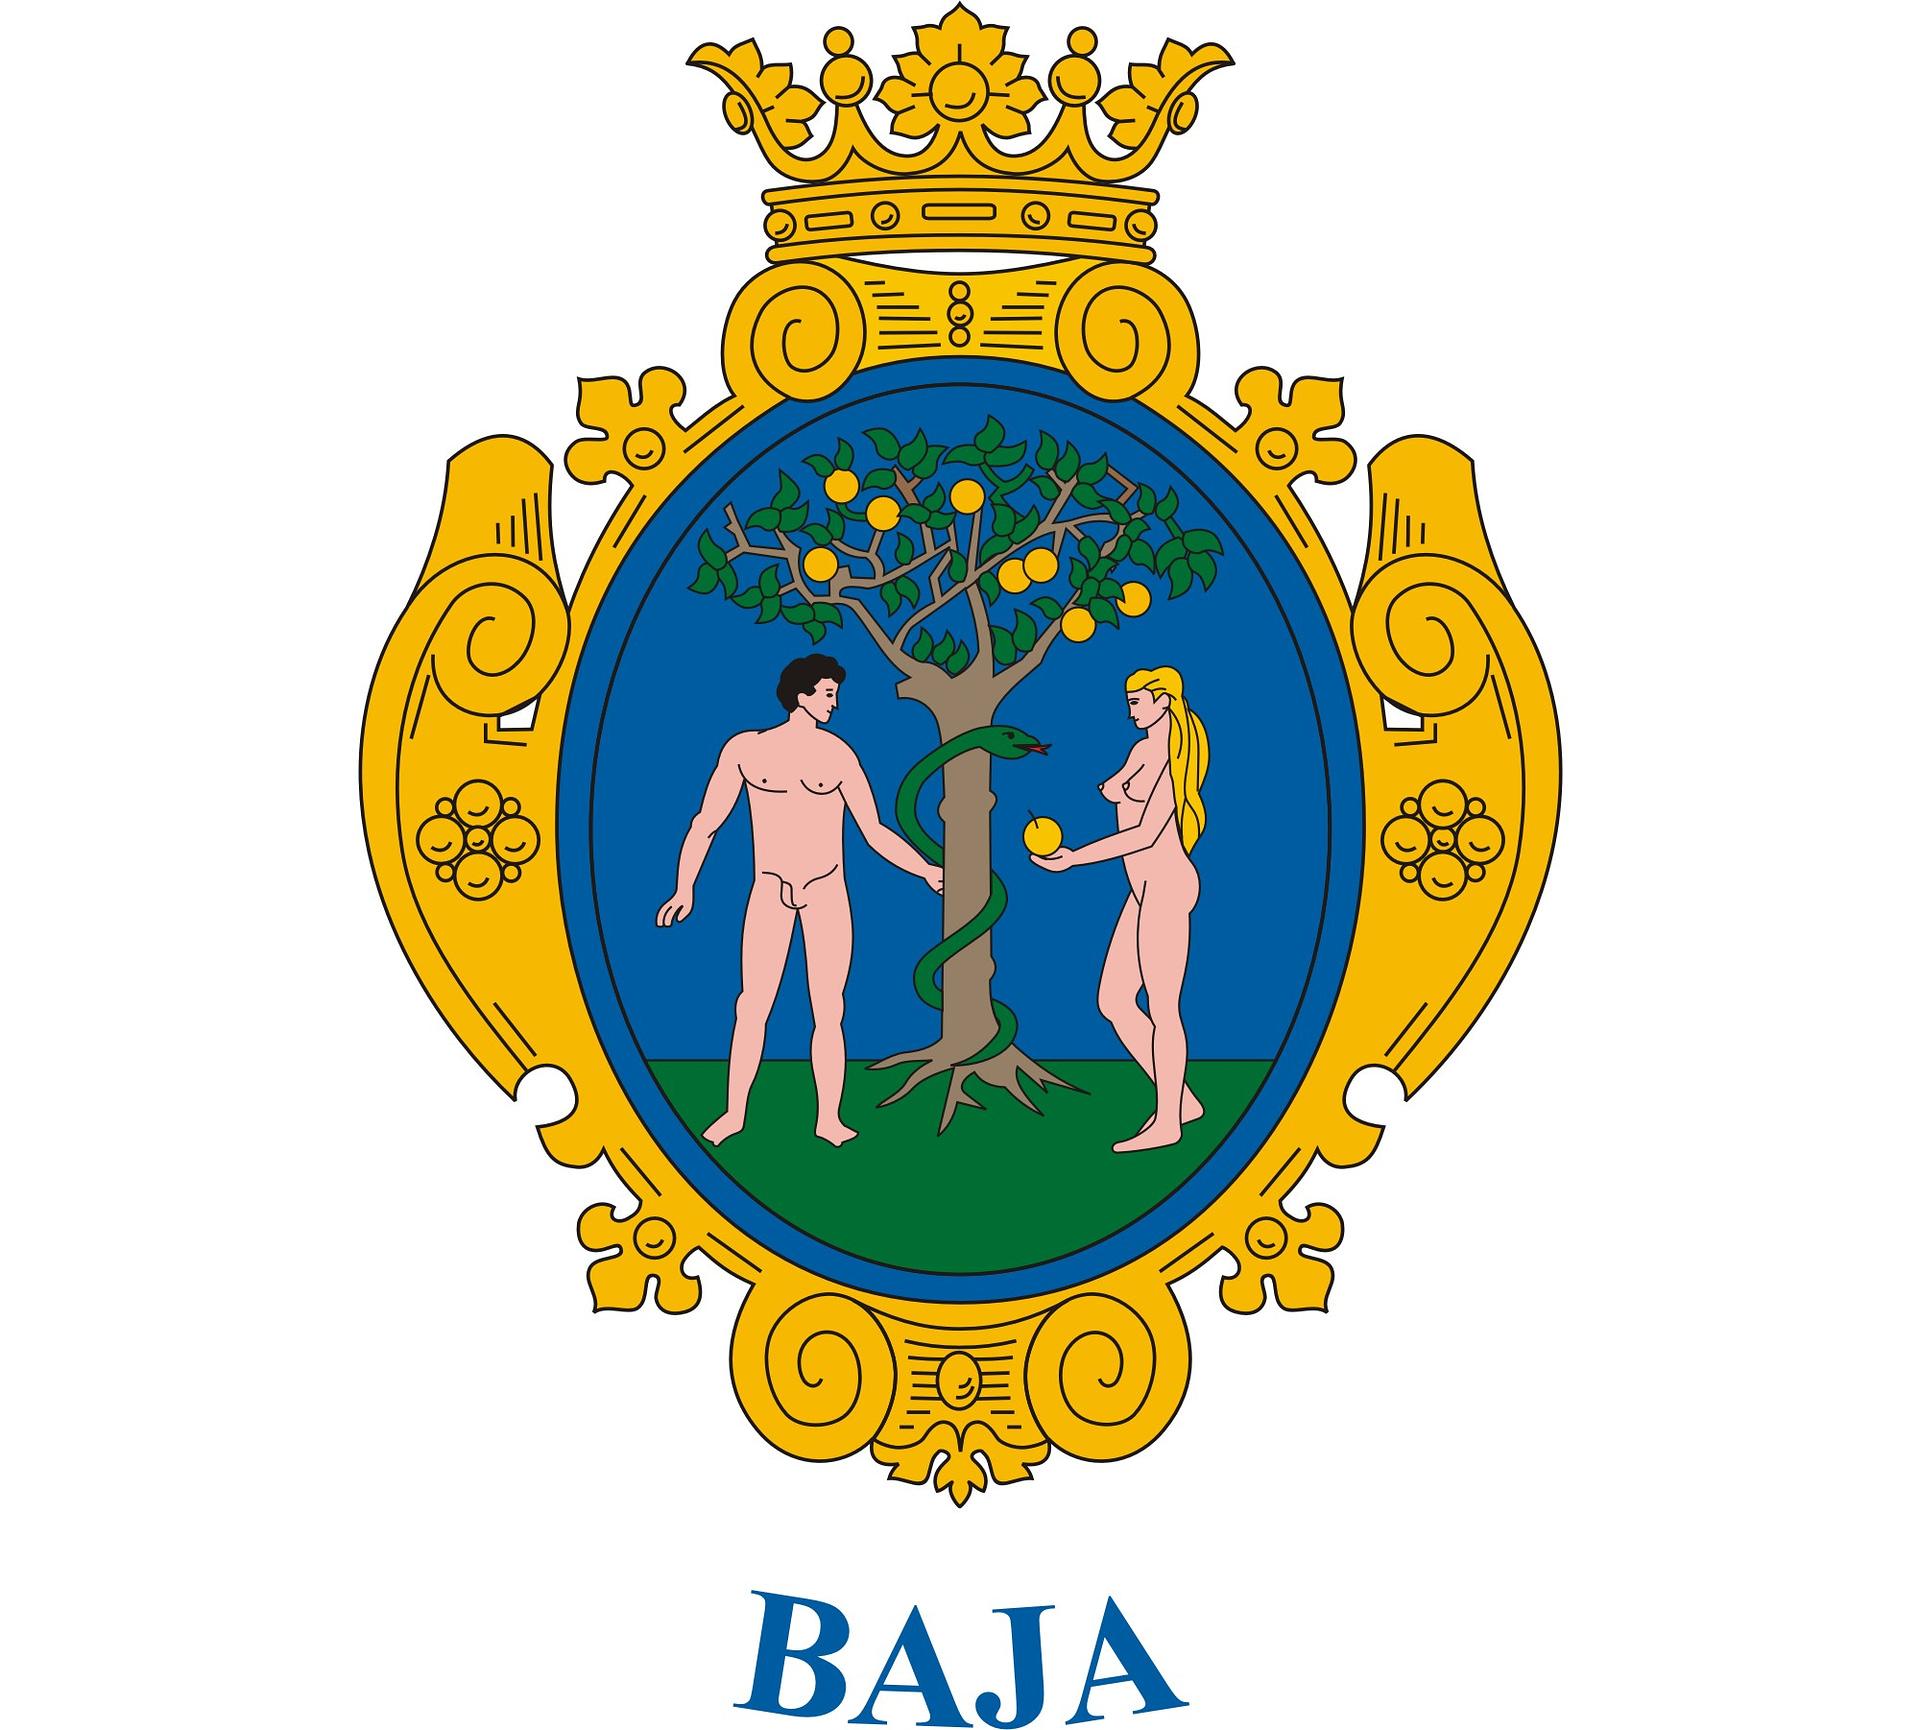 Okospad Baja